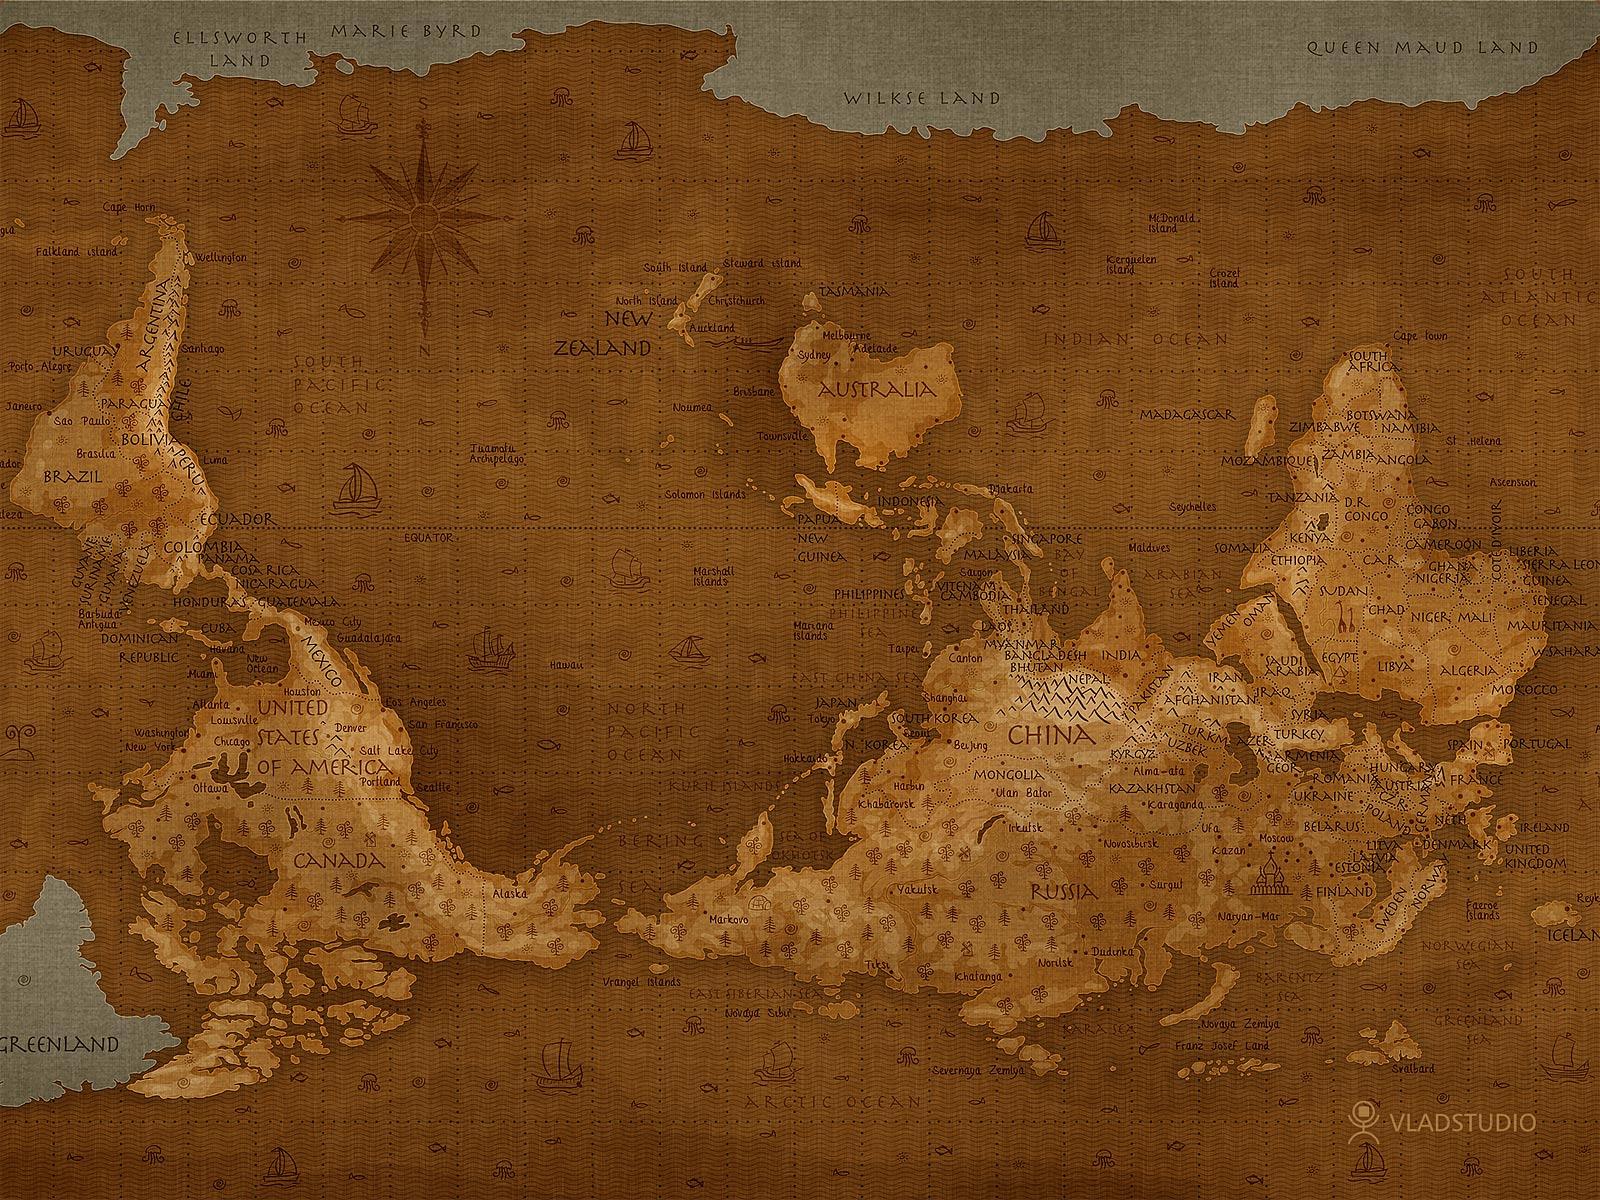 world map upside down by vladstudio